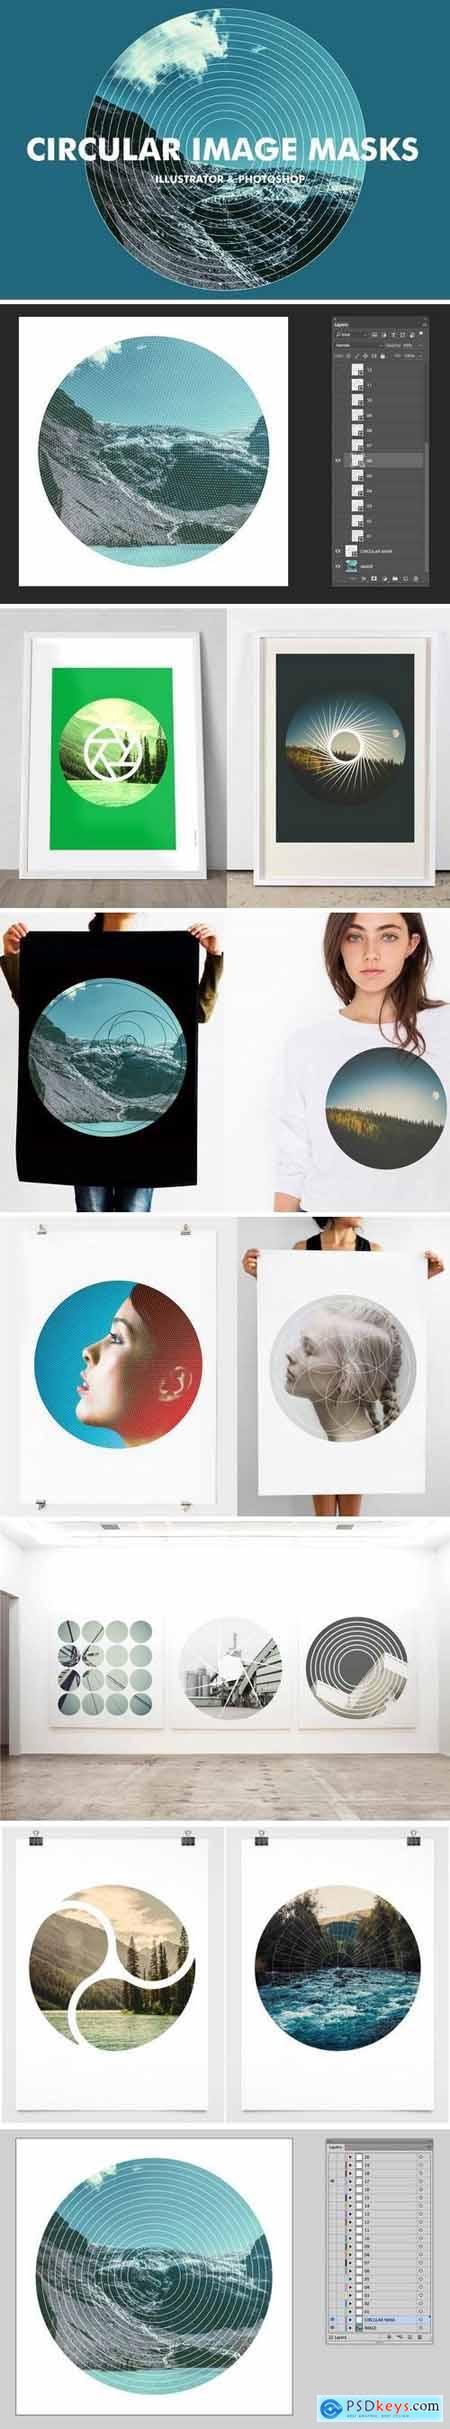 Circular Image Masks